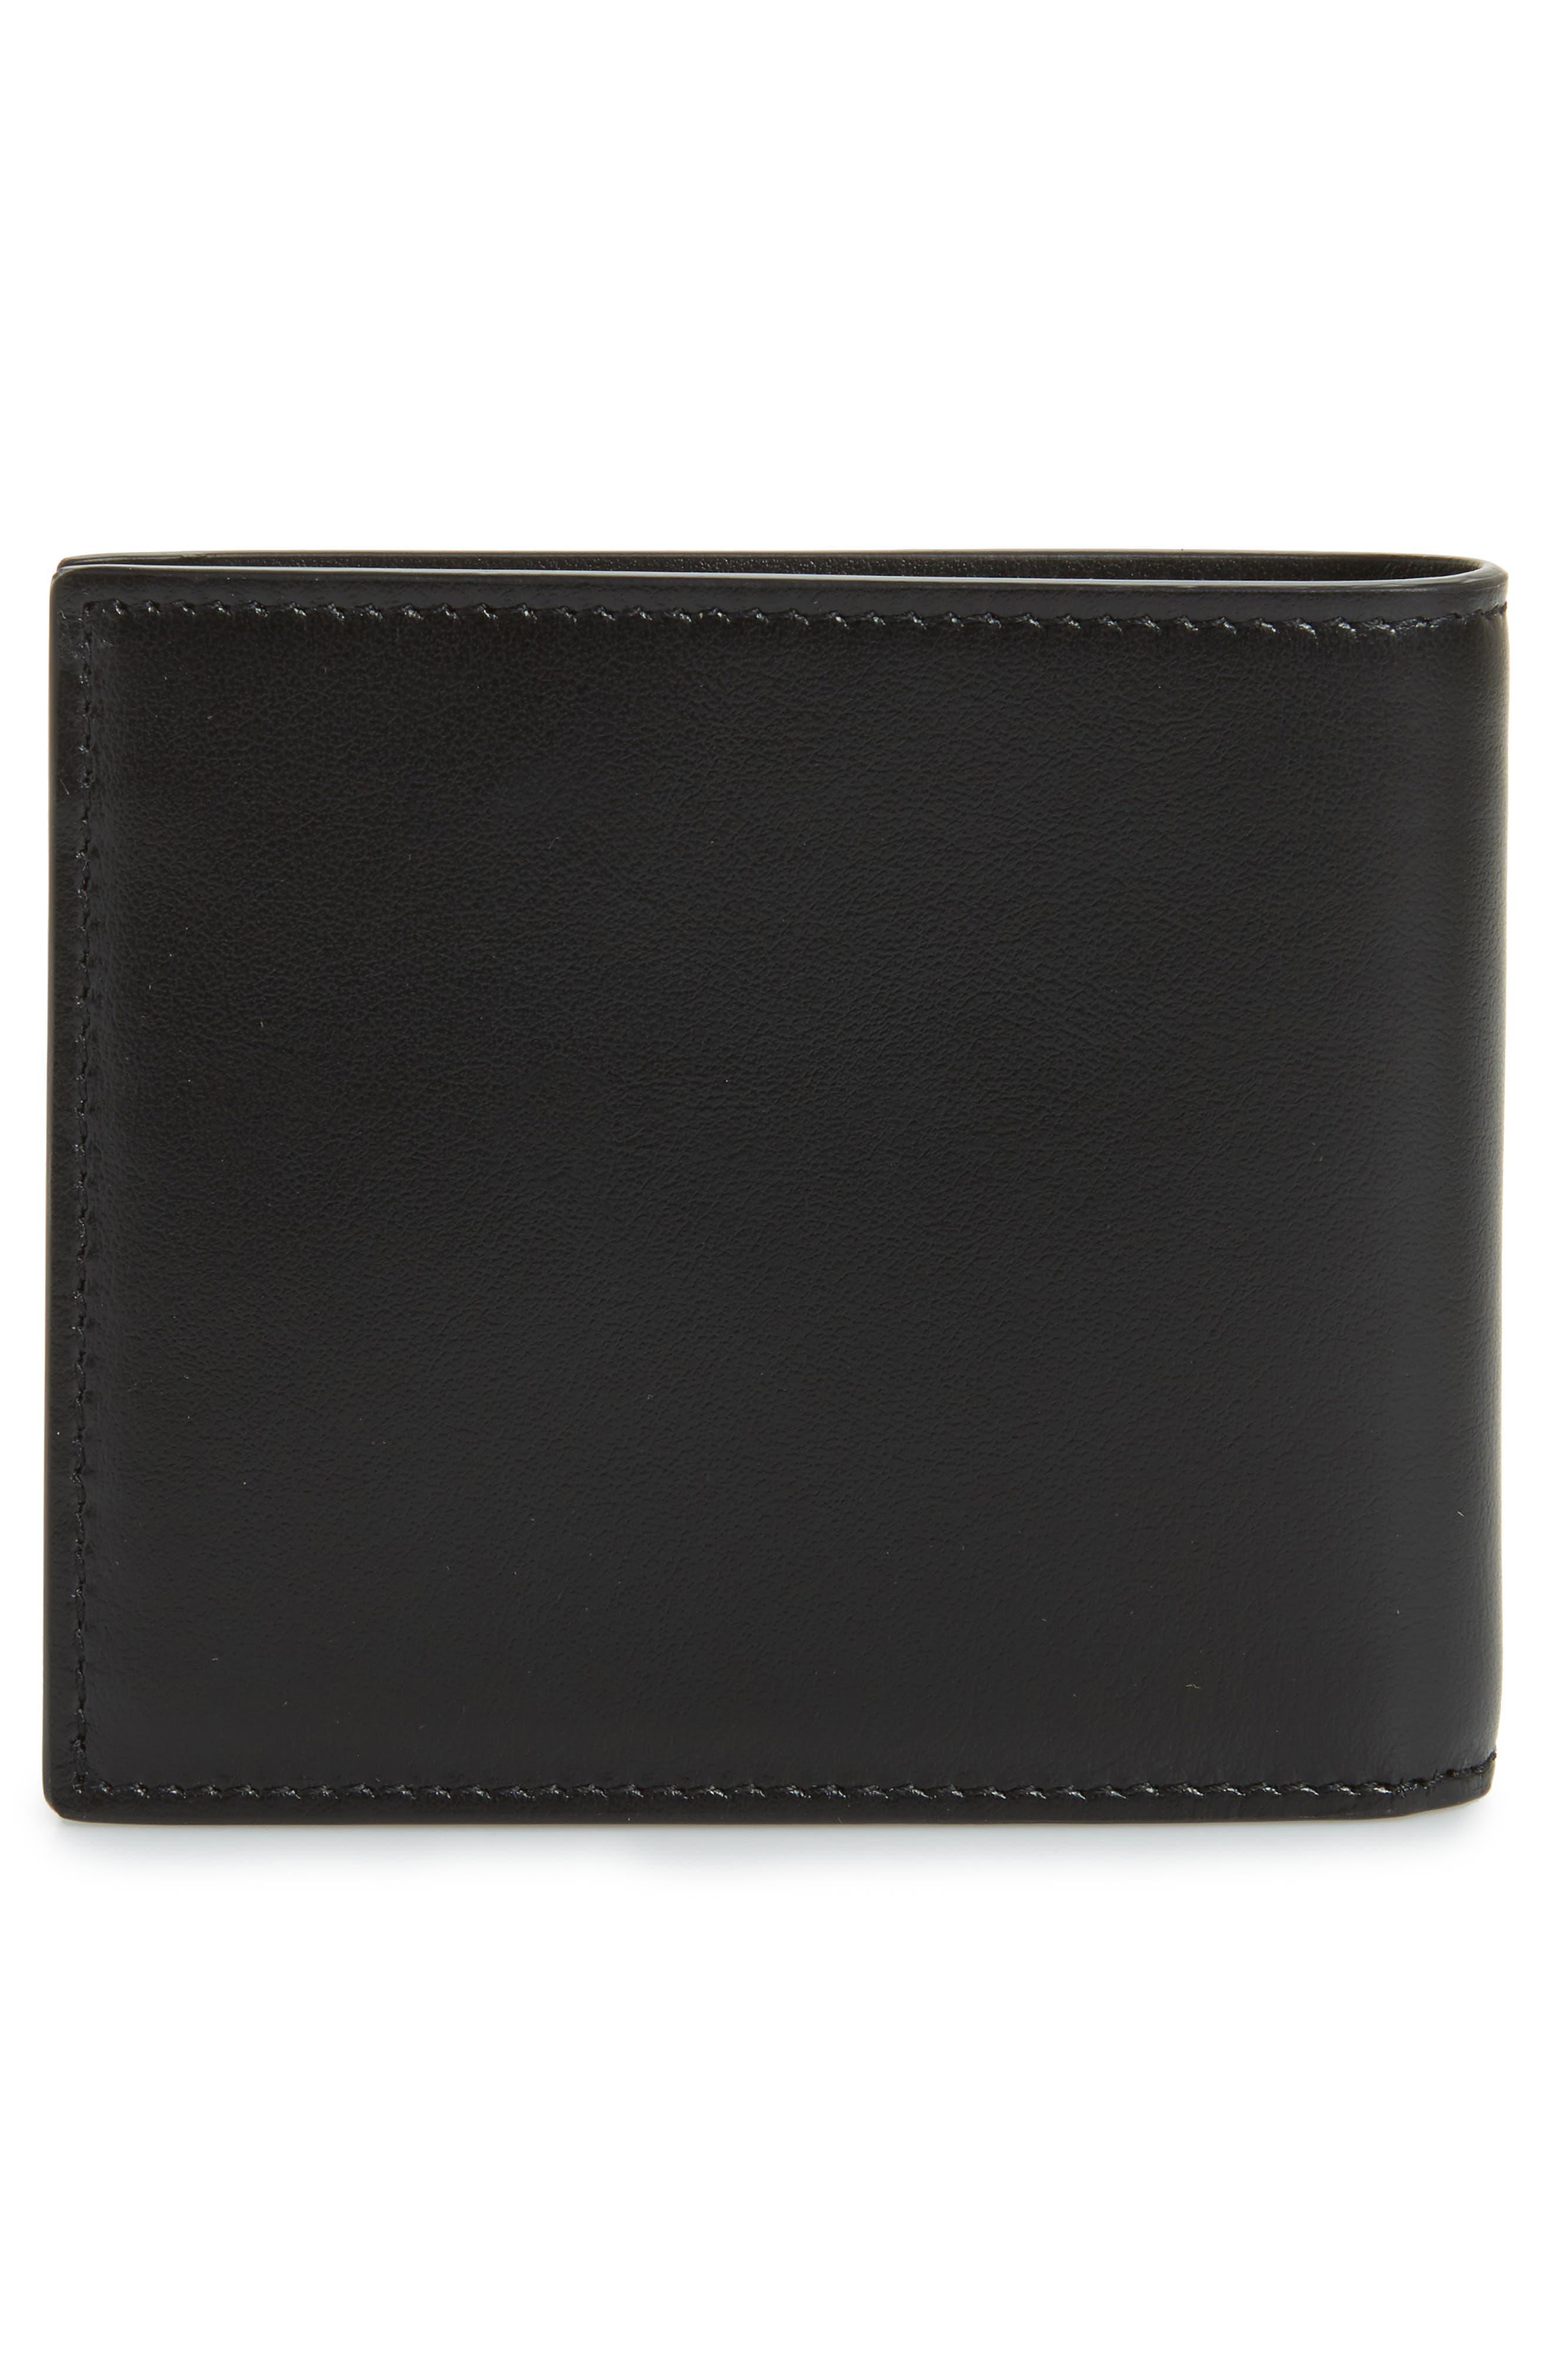 East/West Leather Wallet,                             Alternate thumbnail 3, color,